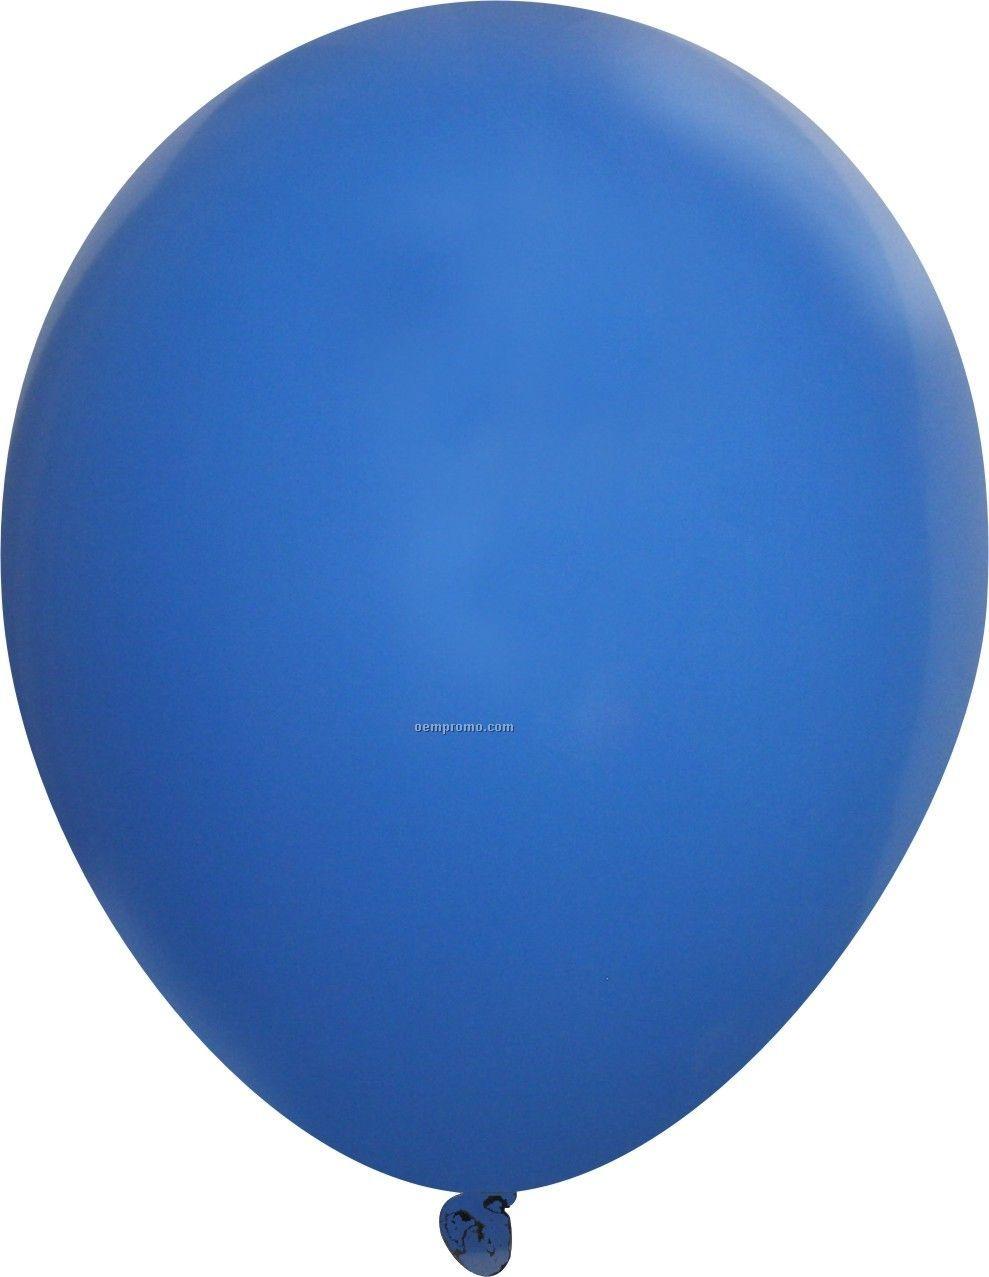 "Unimprinted Jumbo Latex Balloons (48"")"